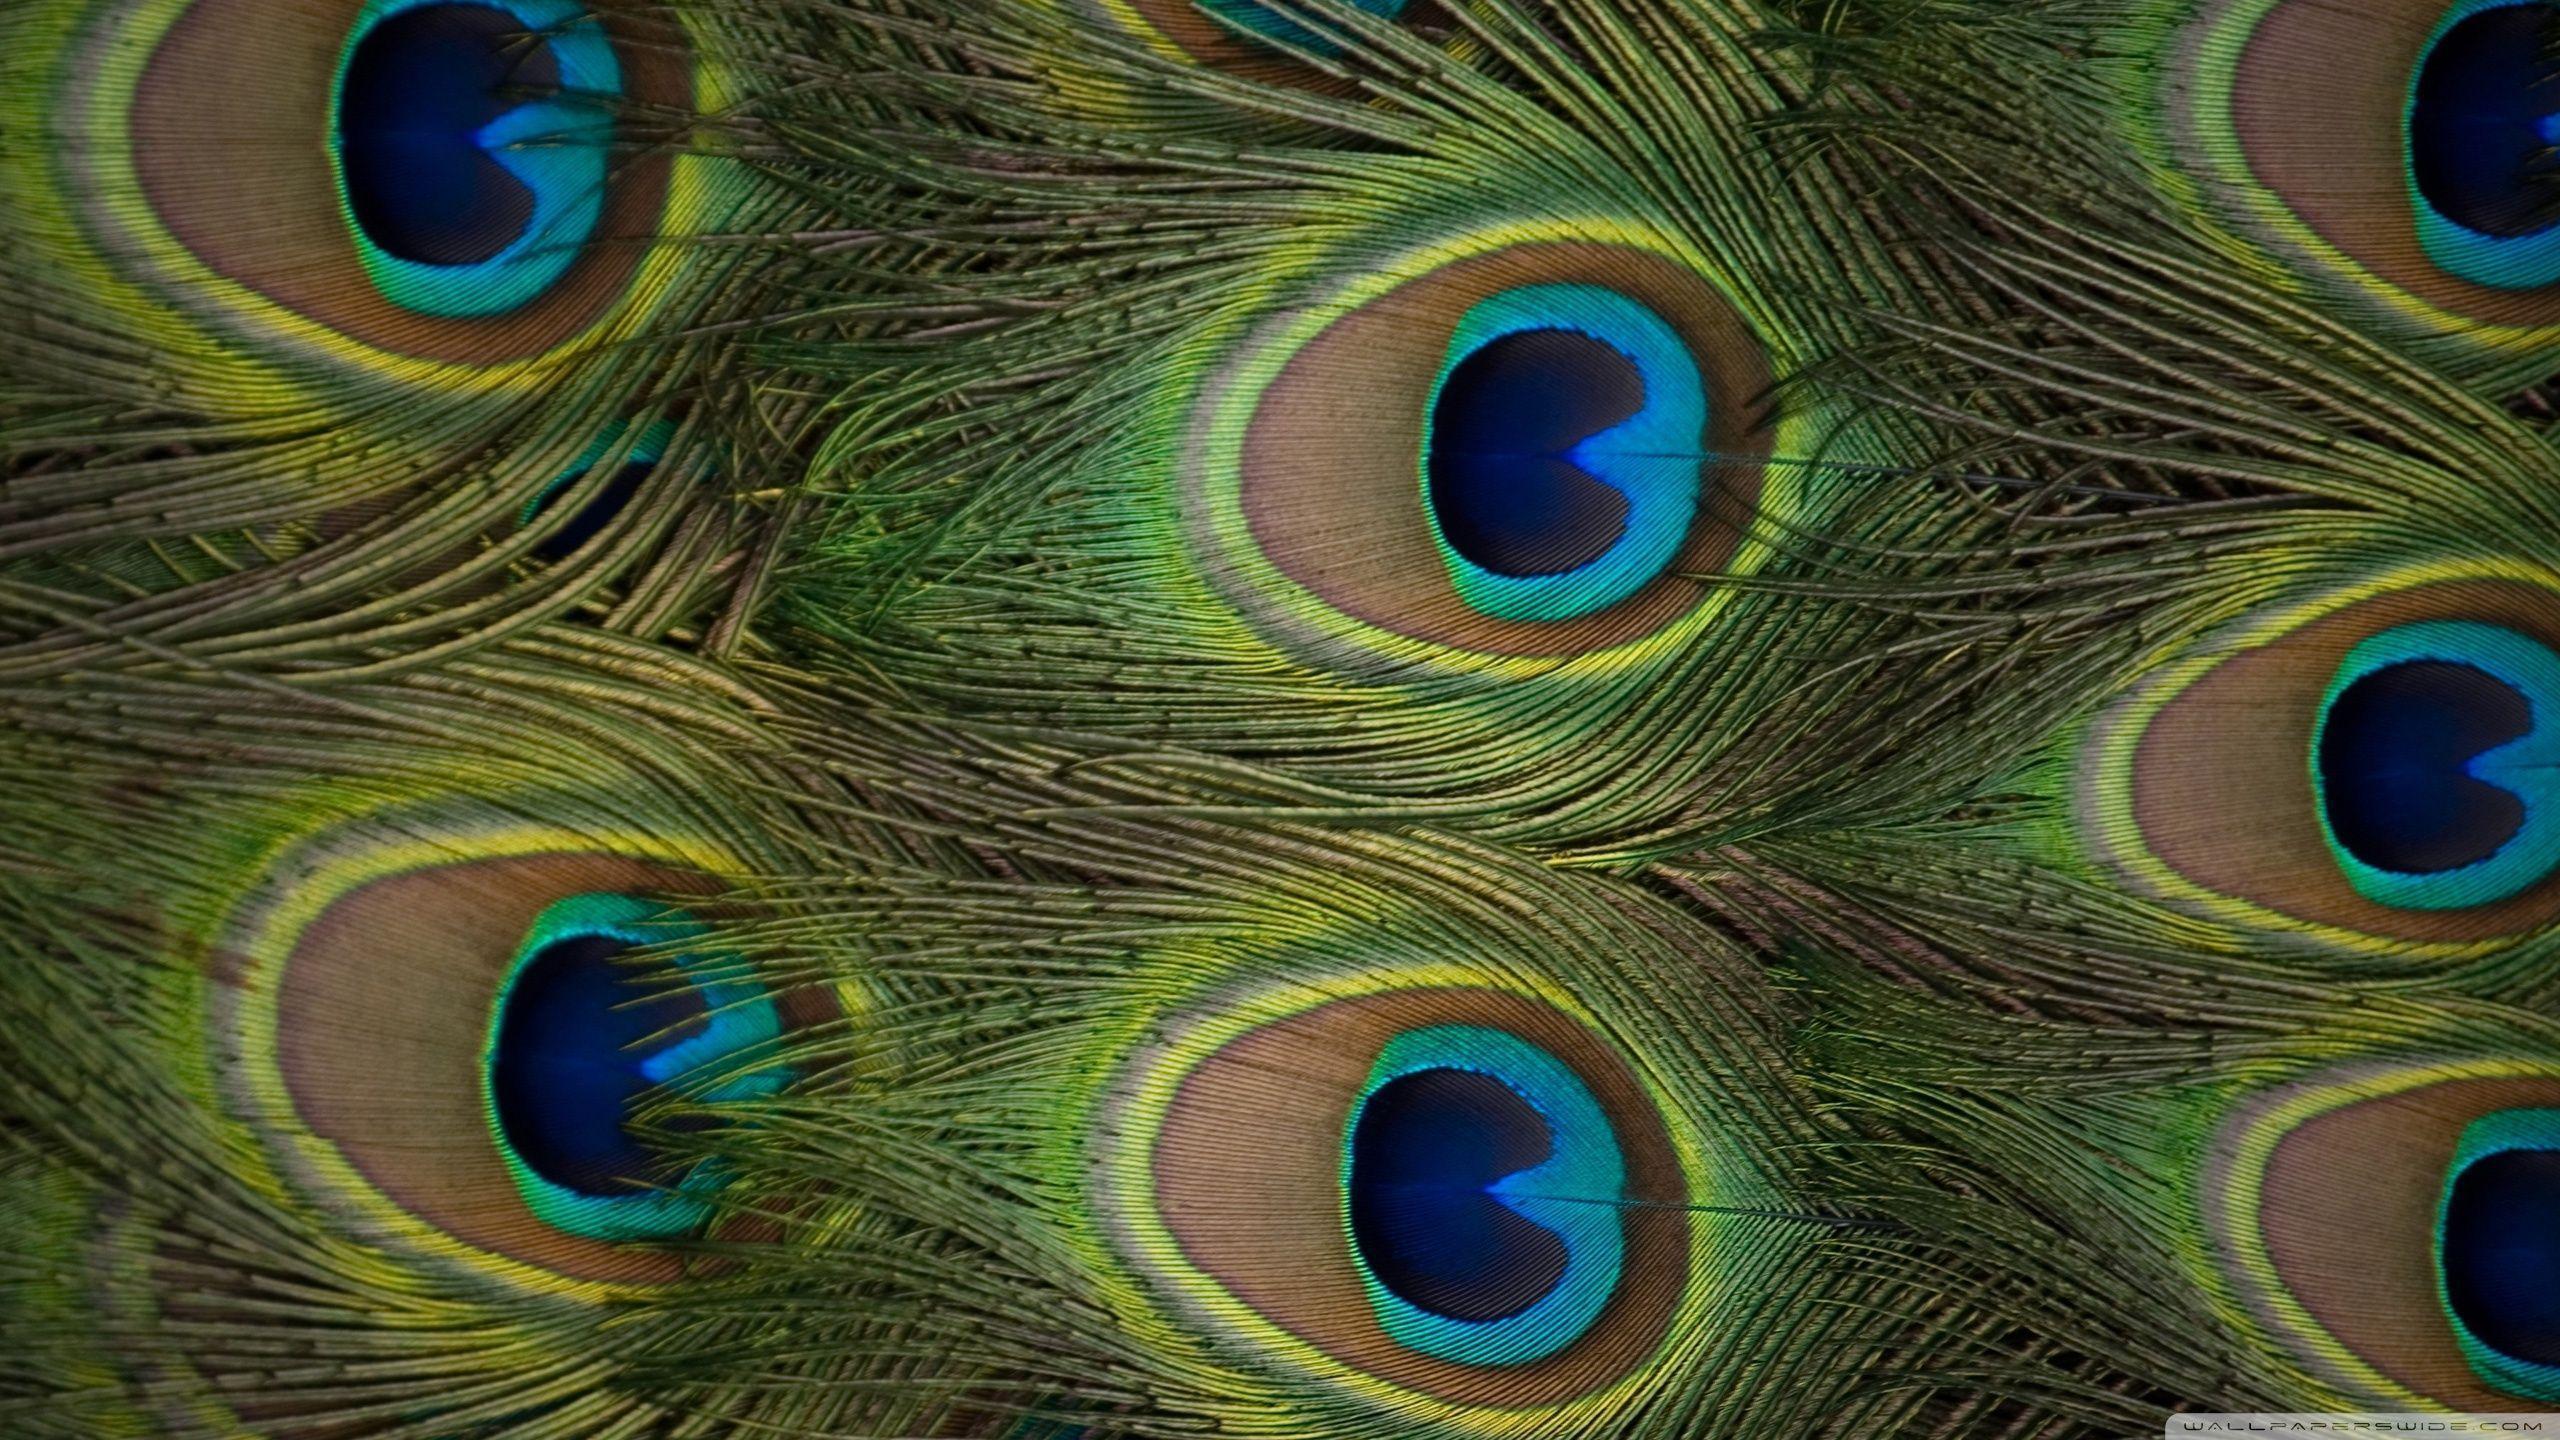 Peacock Feather Desktop Wallpaper Wallpapers Of P...